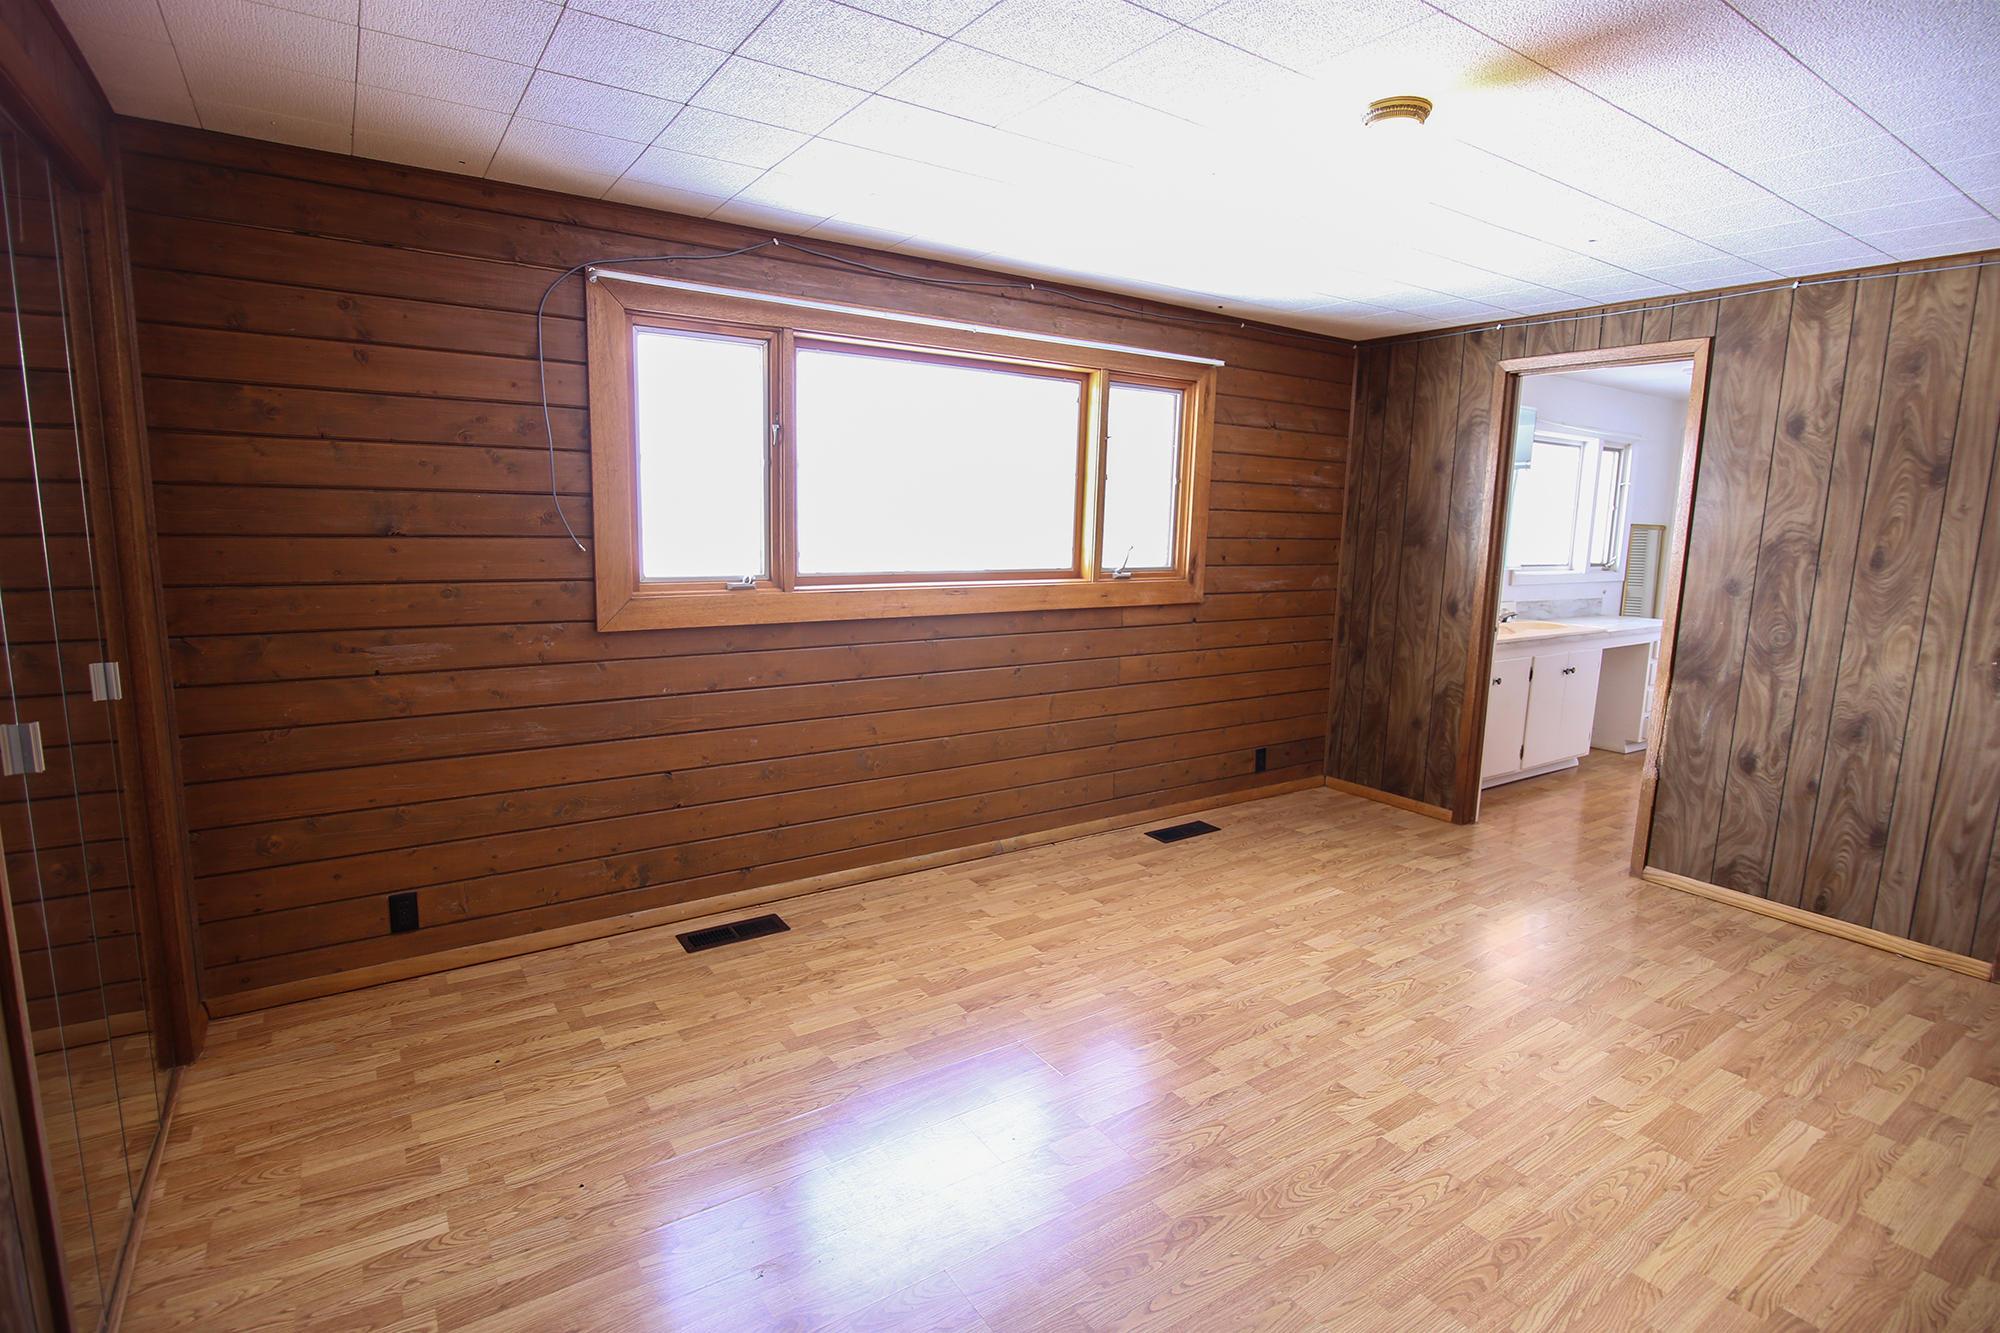 235 Keystone Road, Sheridan, Wyoming 82801, 4 Bedrooms Bedrooms, ,2 BathroomsBathrooms,Ranch,For Sale,Keystone,19-174